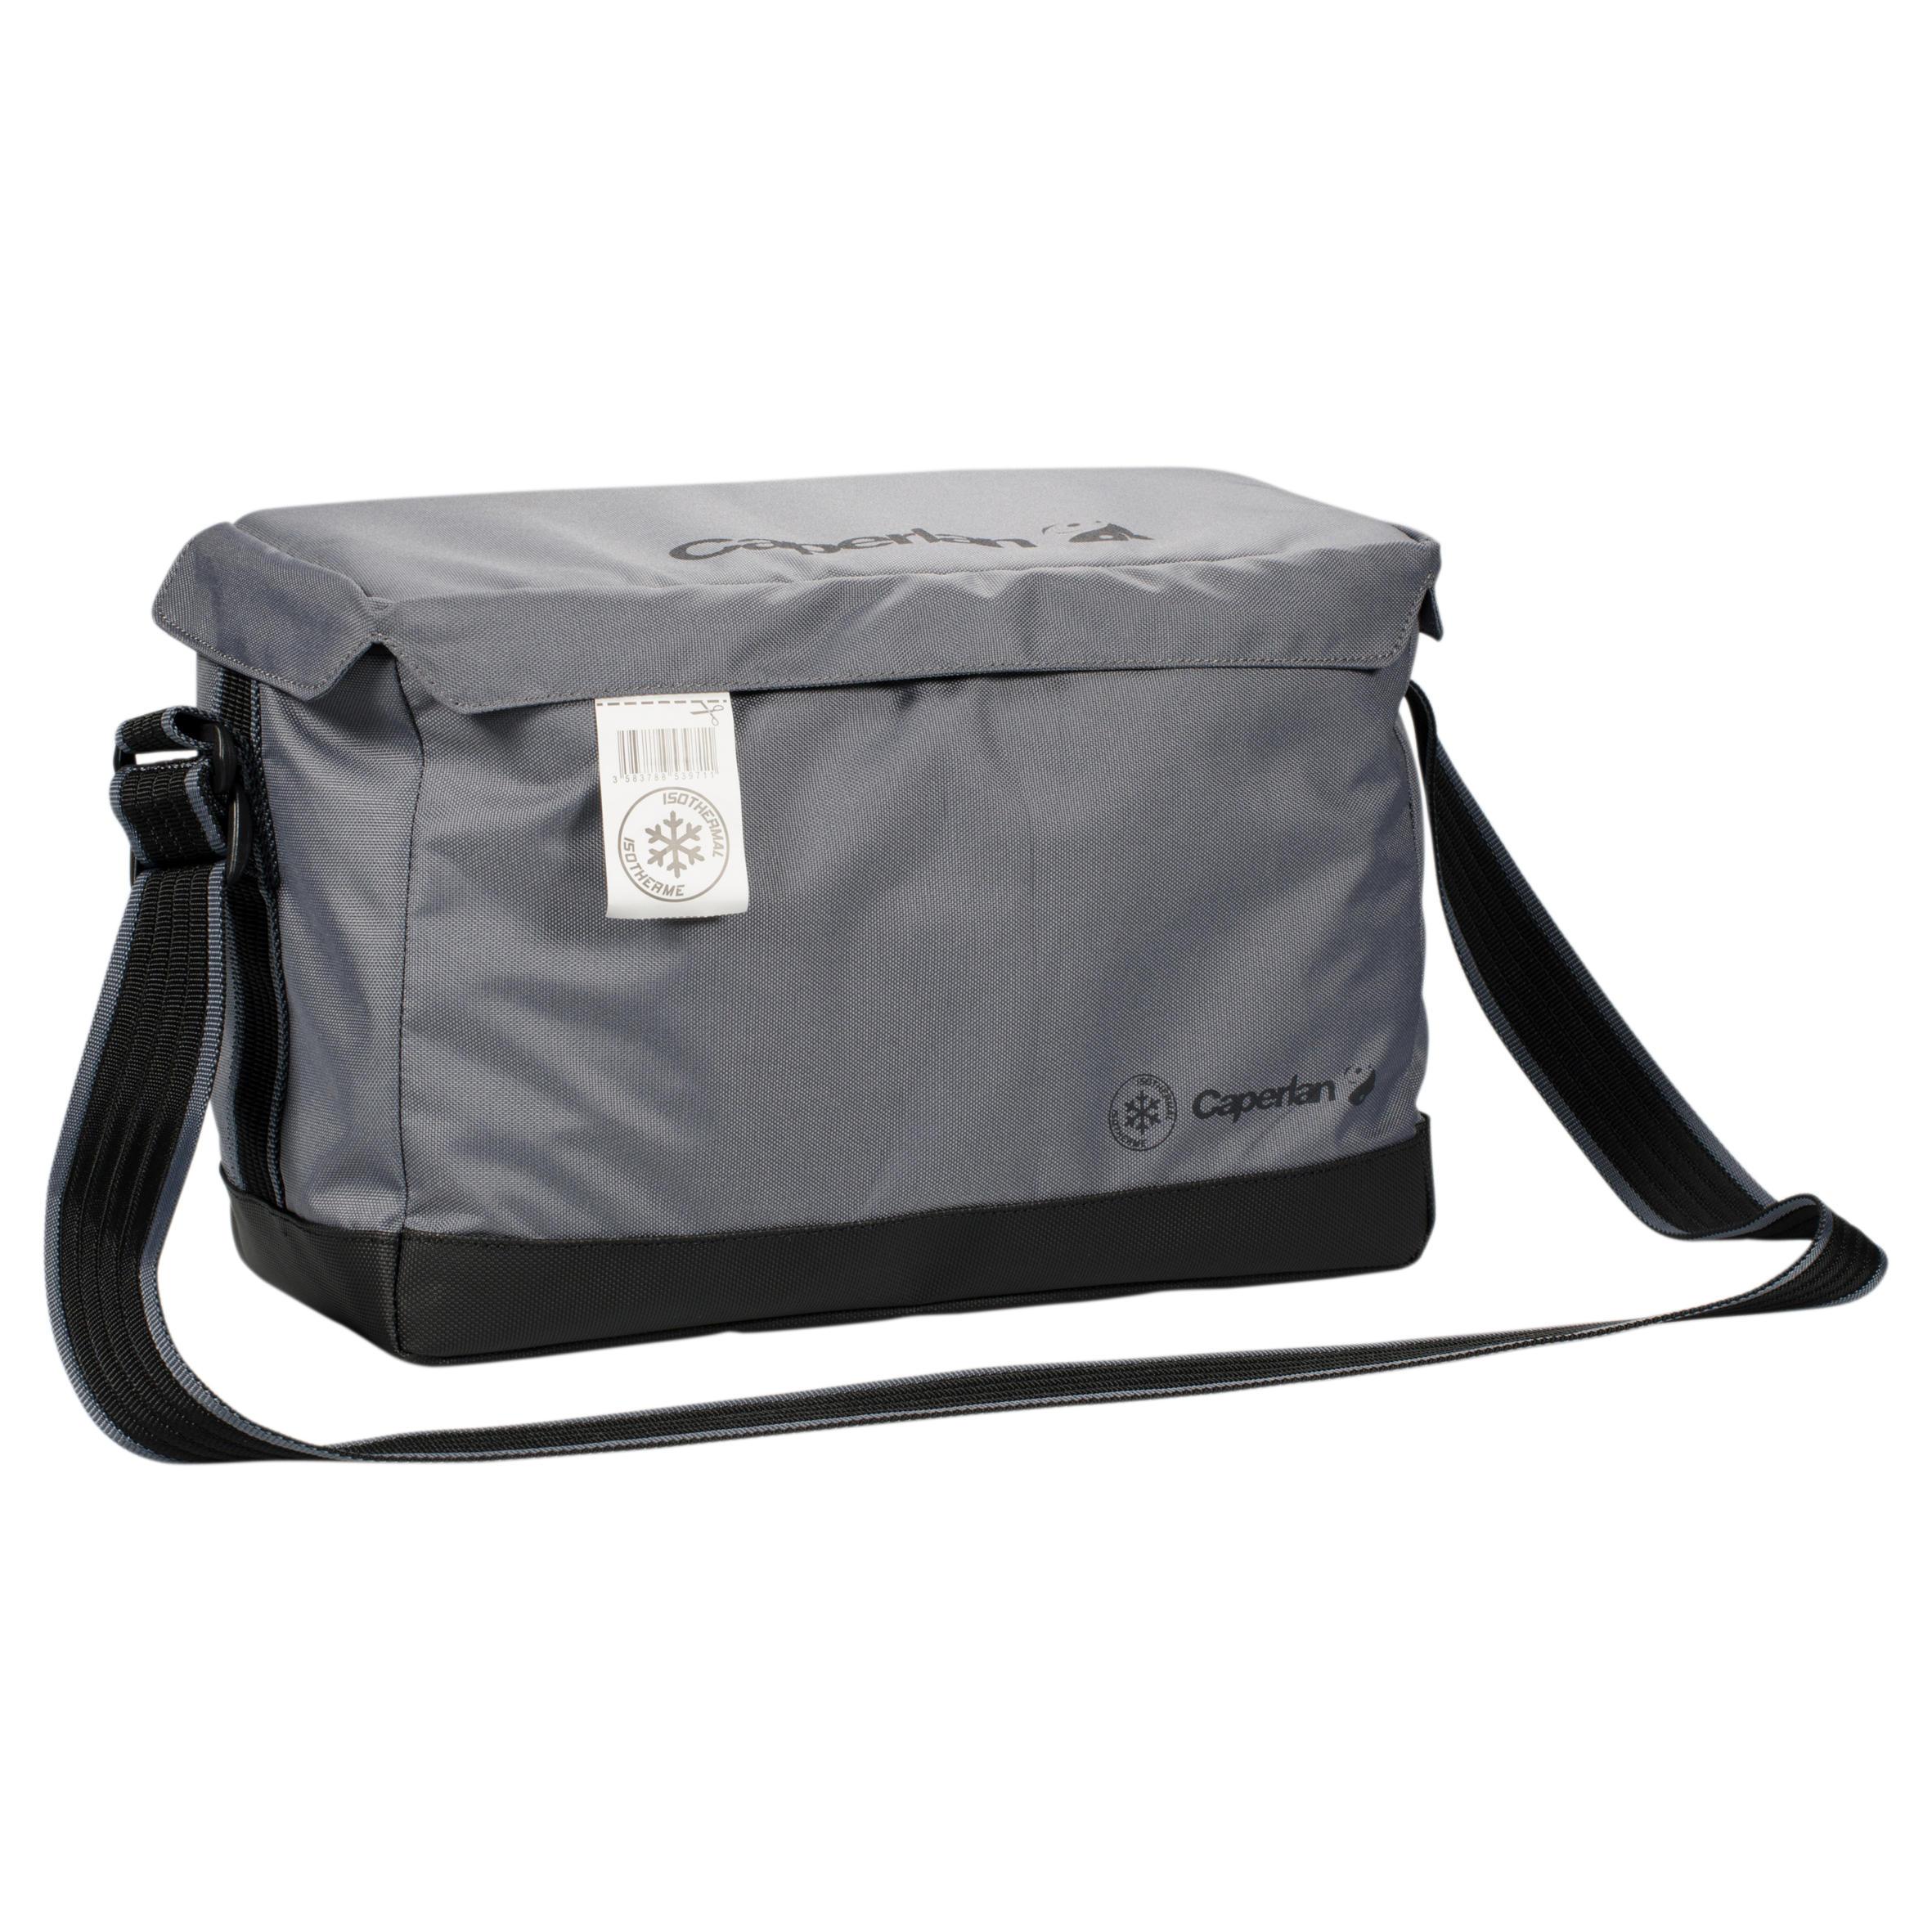 ICEBAG cool bag Size: M